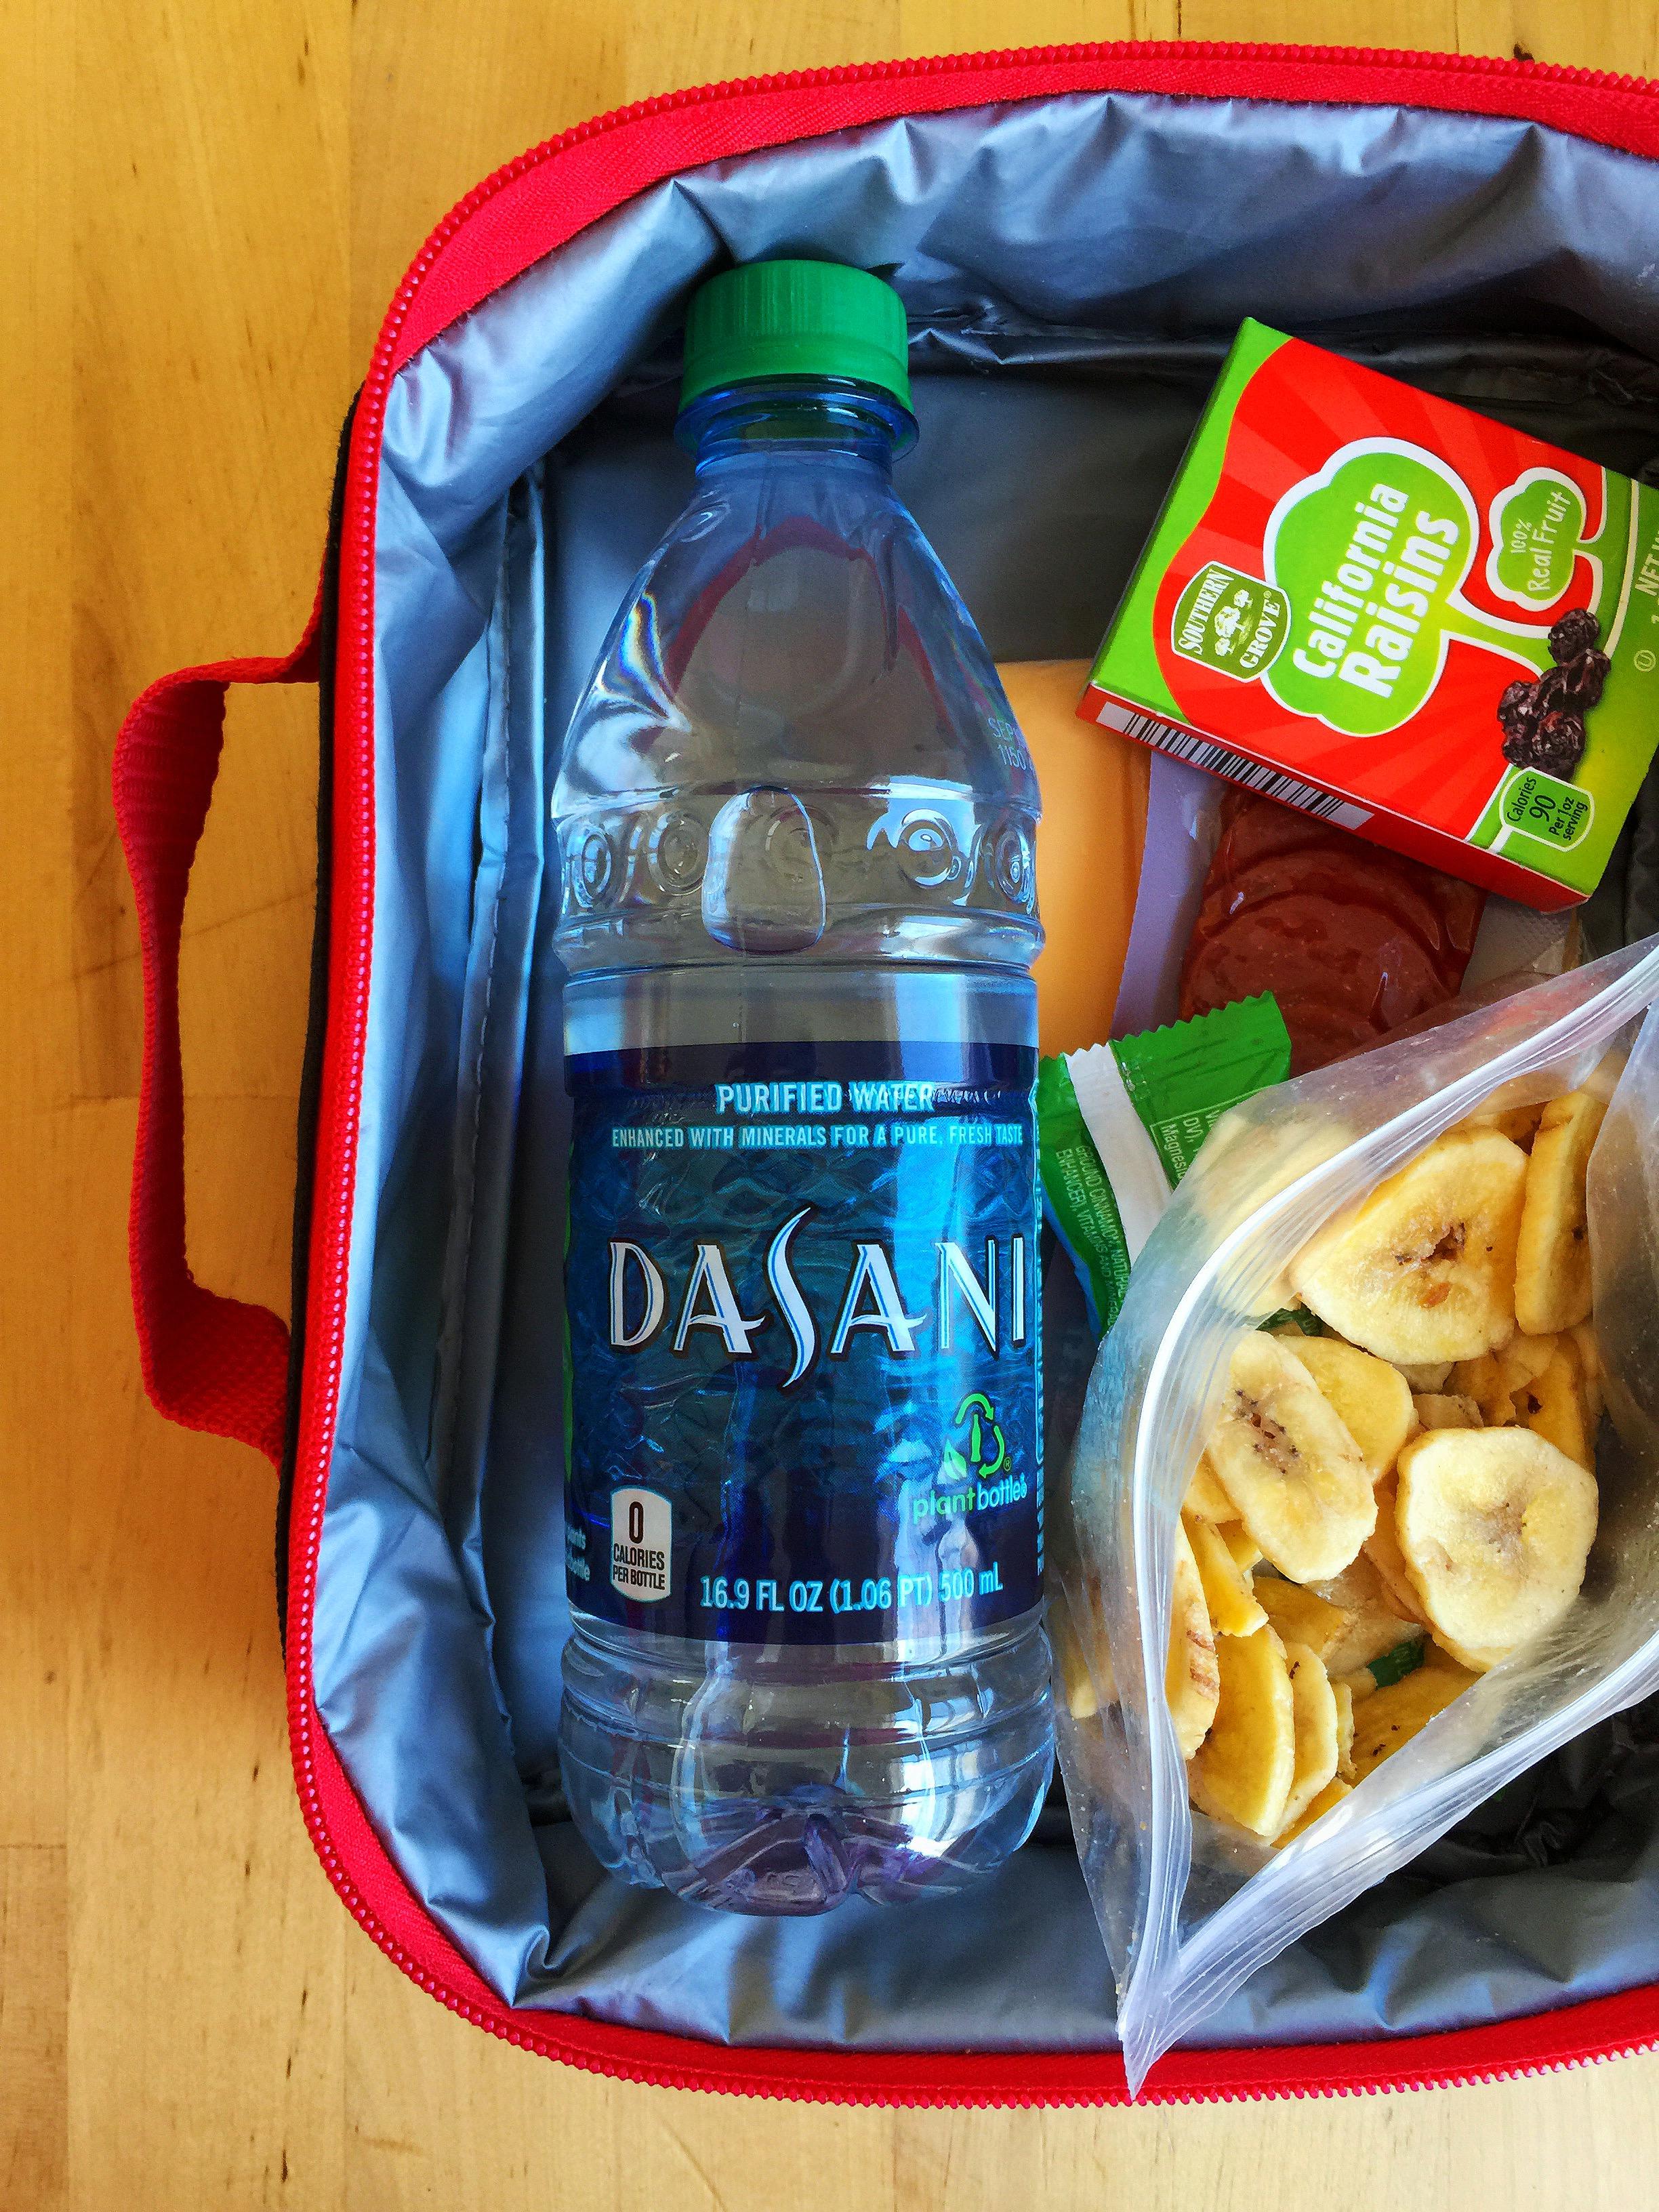 Keep School Lunches Sustainable With Desani PlantBottle® © www.roastedbeanz.com #GreenBottleCap #ad #datarank